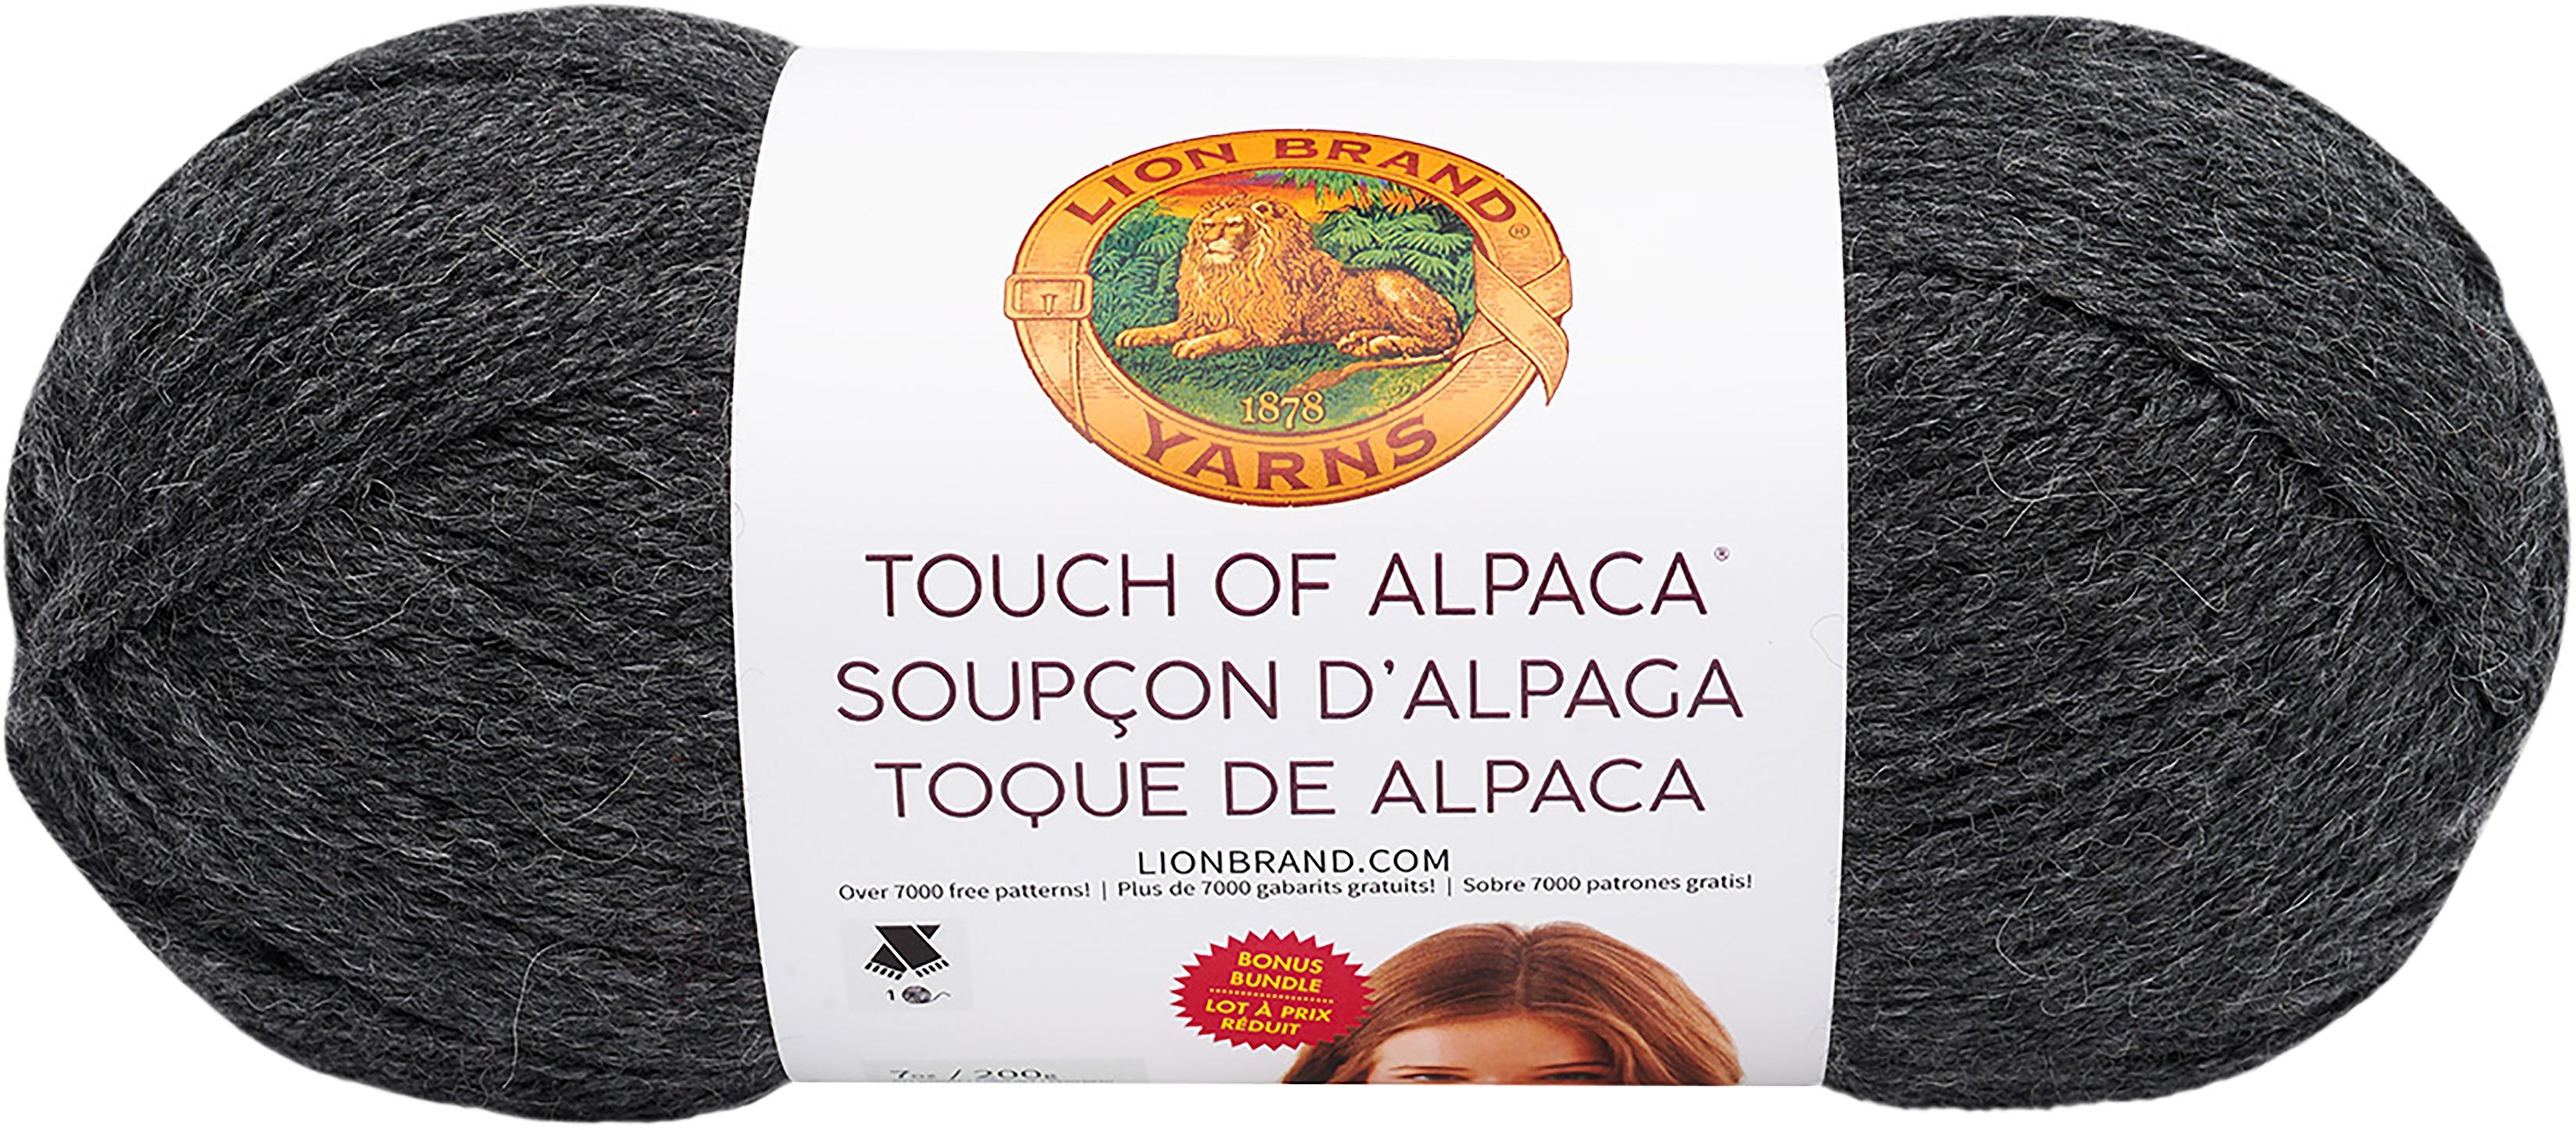 Lion Brand Touch Of Alpaca Bonus Bundle Yarn